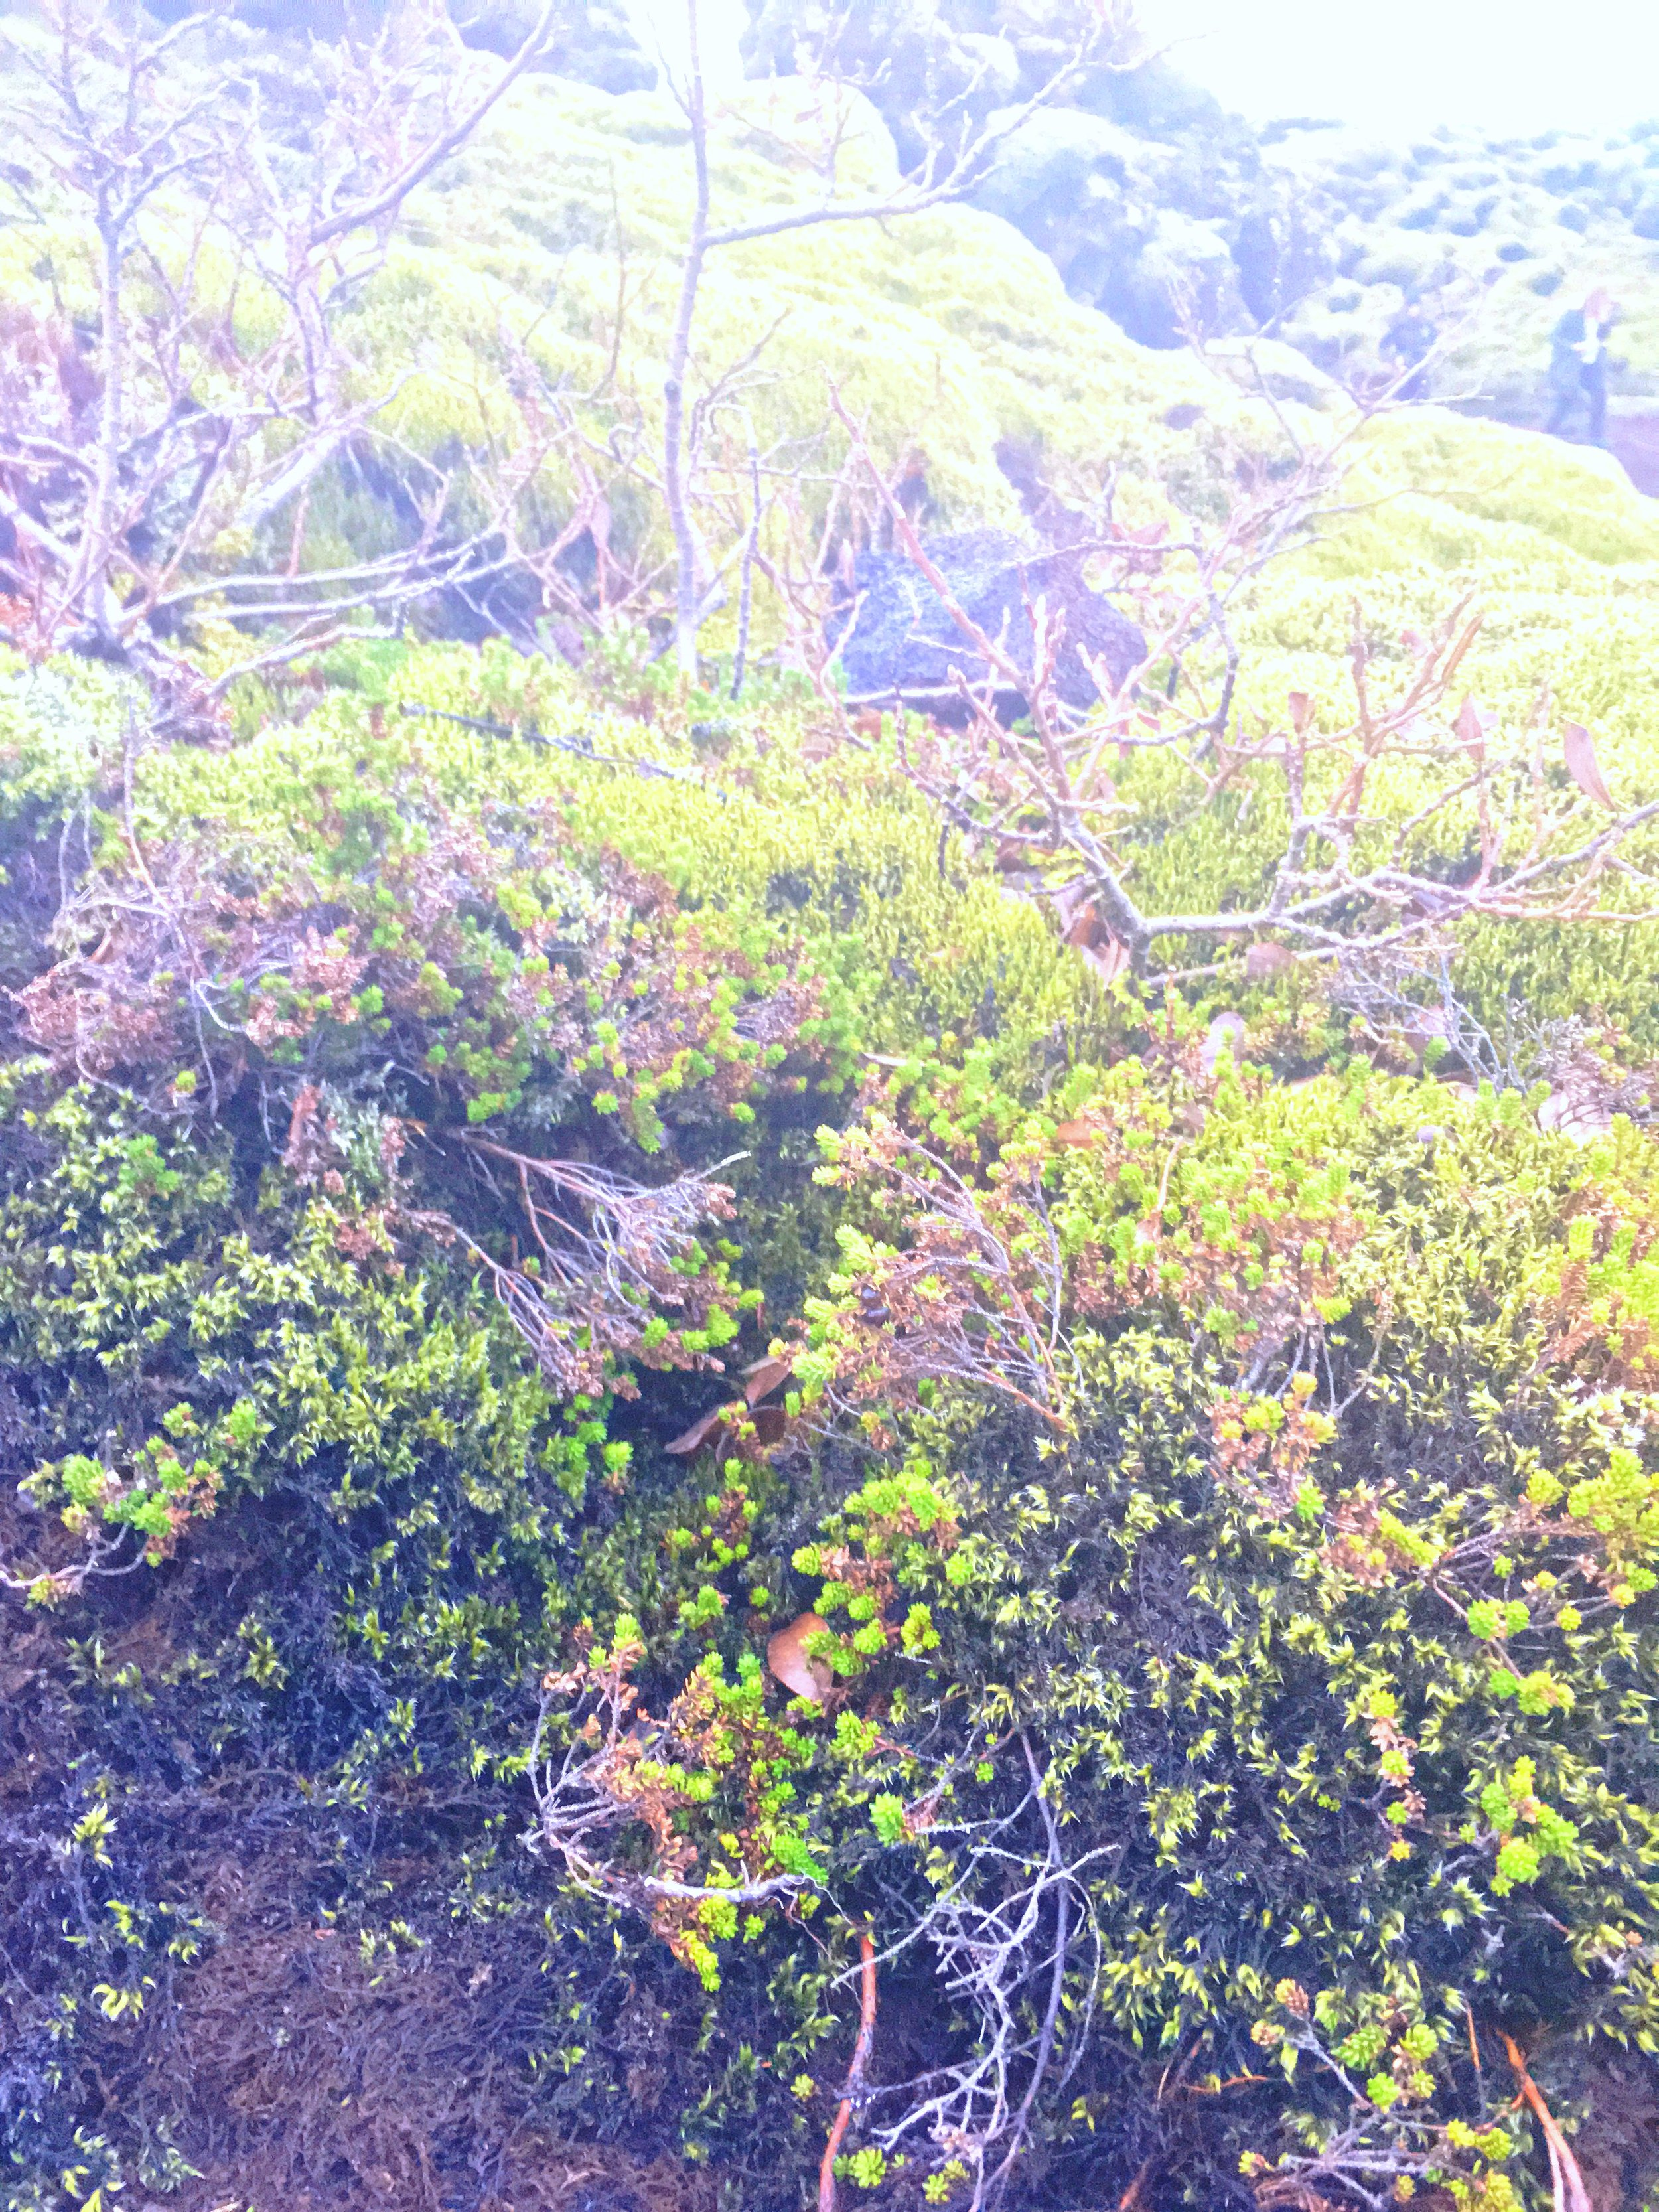 Vegetation grows on lava rocks on Iceland's Ring Road in Skaftarhreppur.